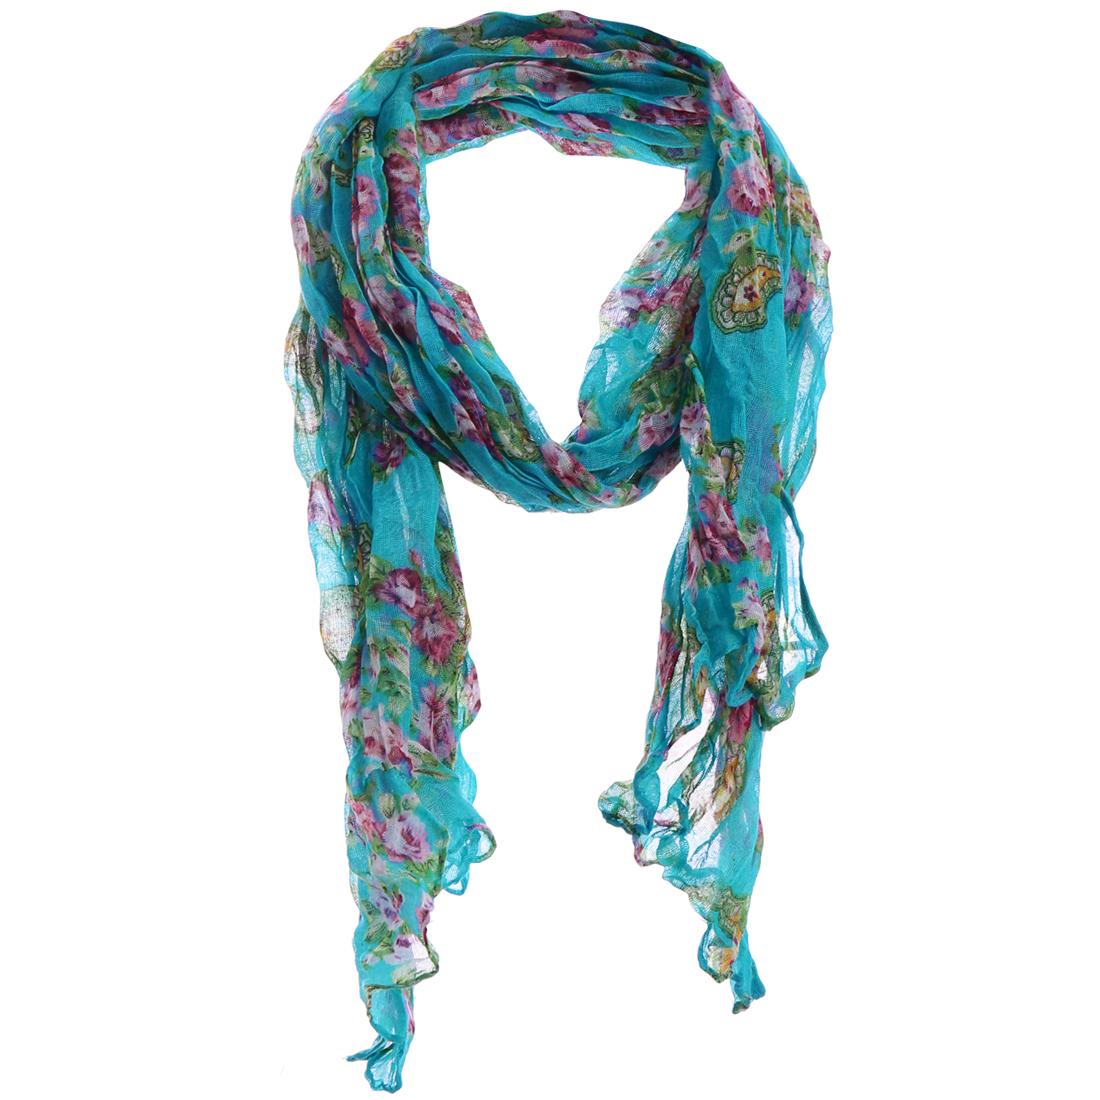 Ladies Coat Decor Floral Prints Stylish Sea Blue Scarf